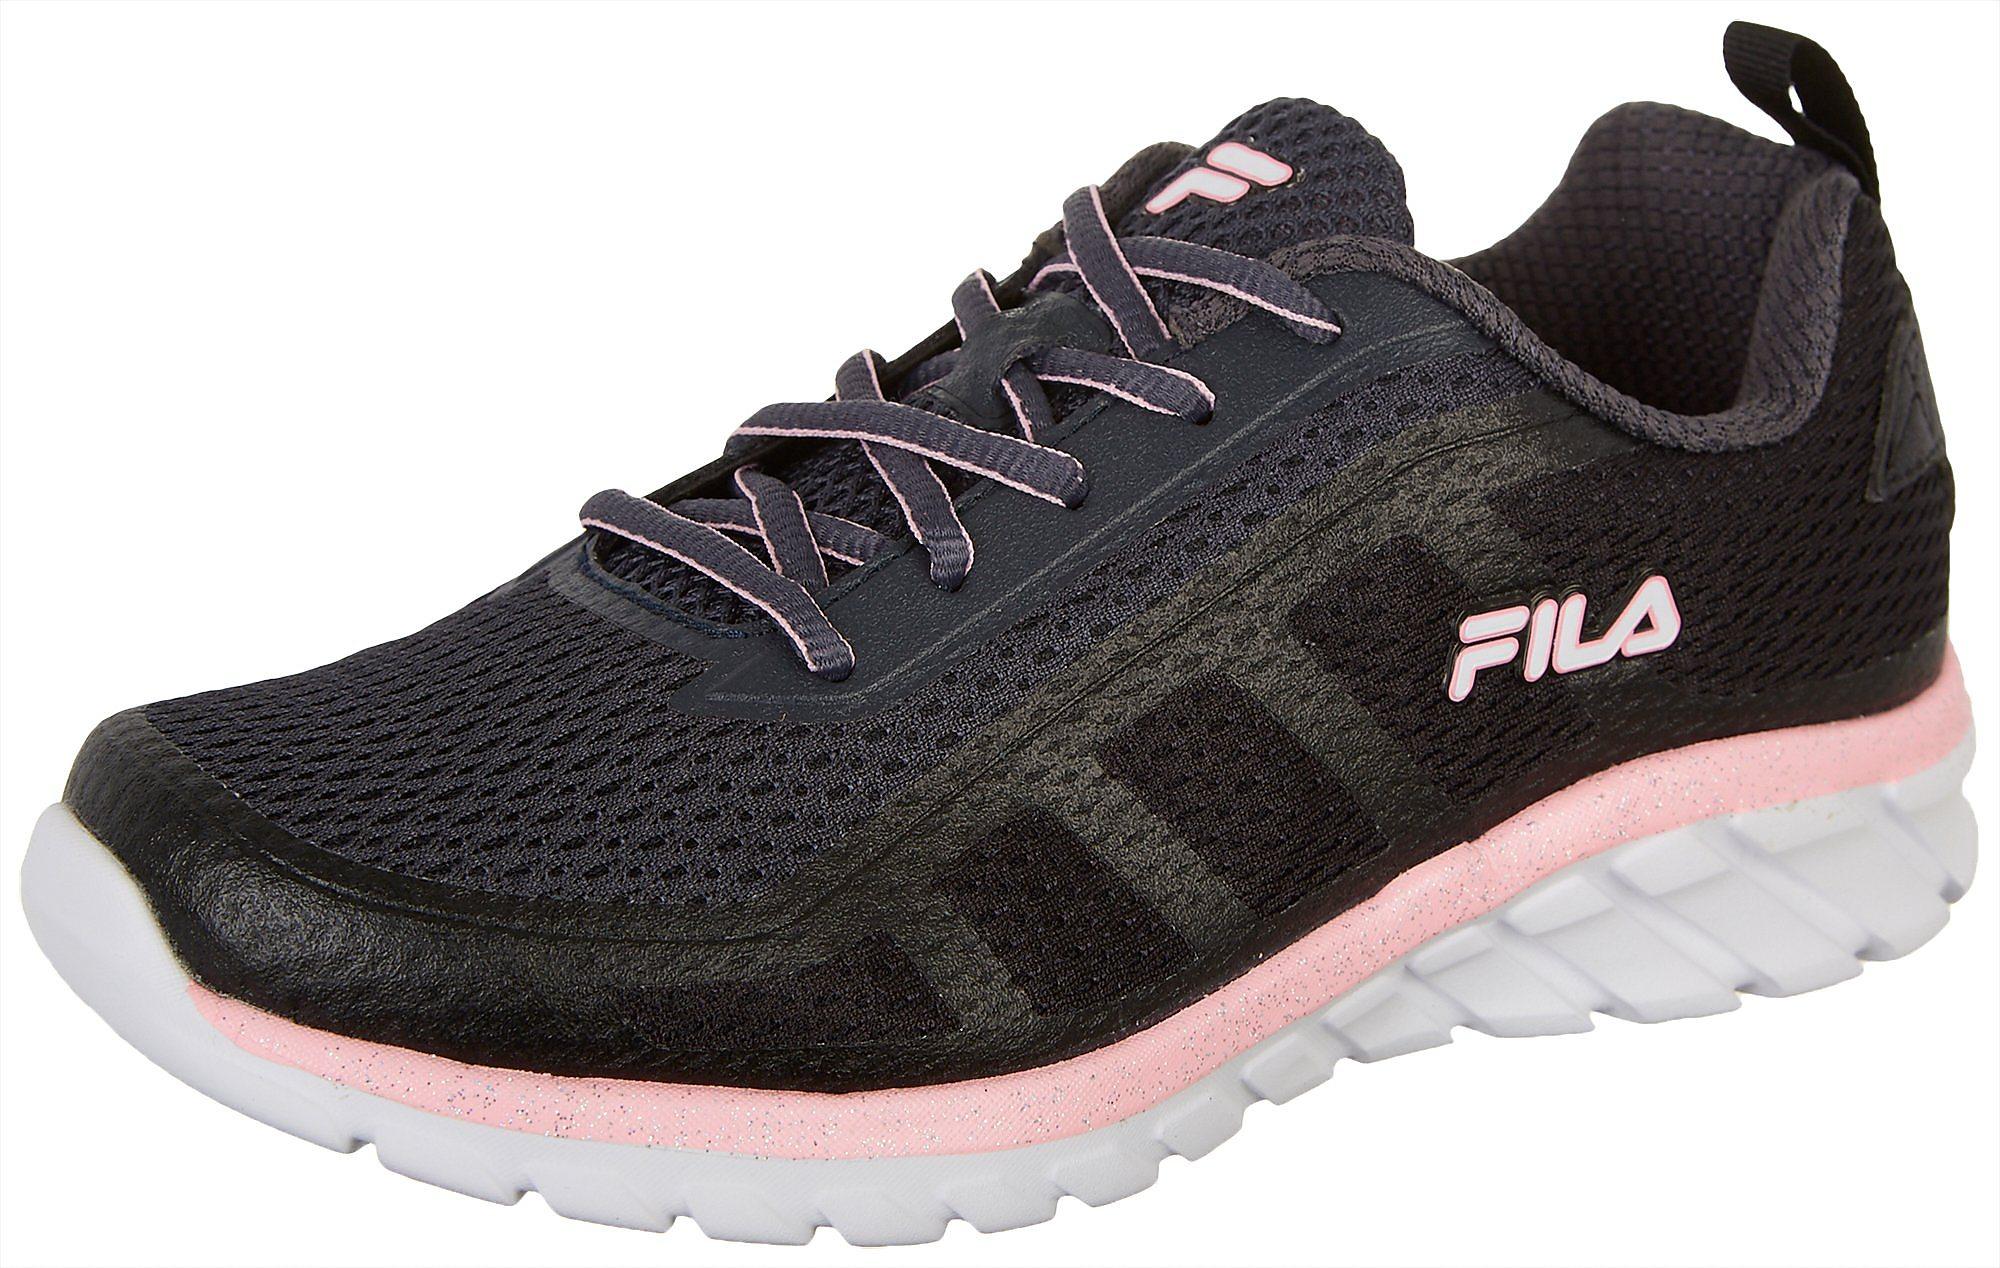 Details about Fila Girls Diskize 2 Athletic Shoes